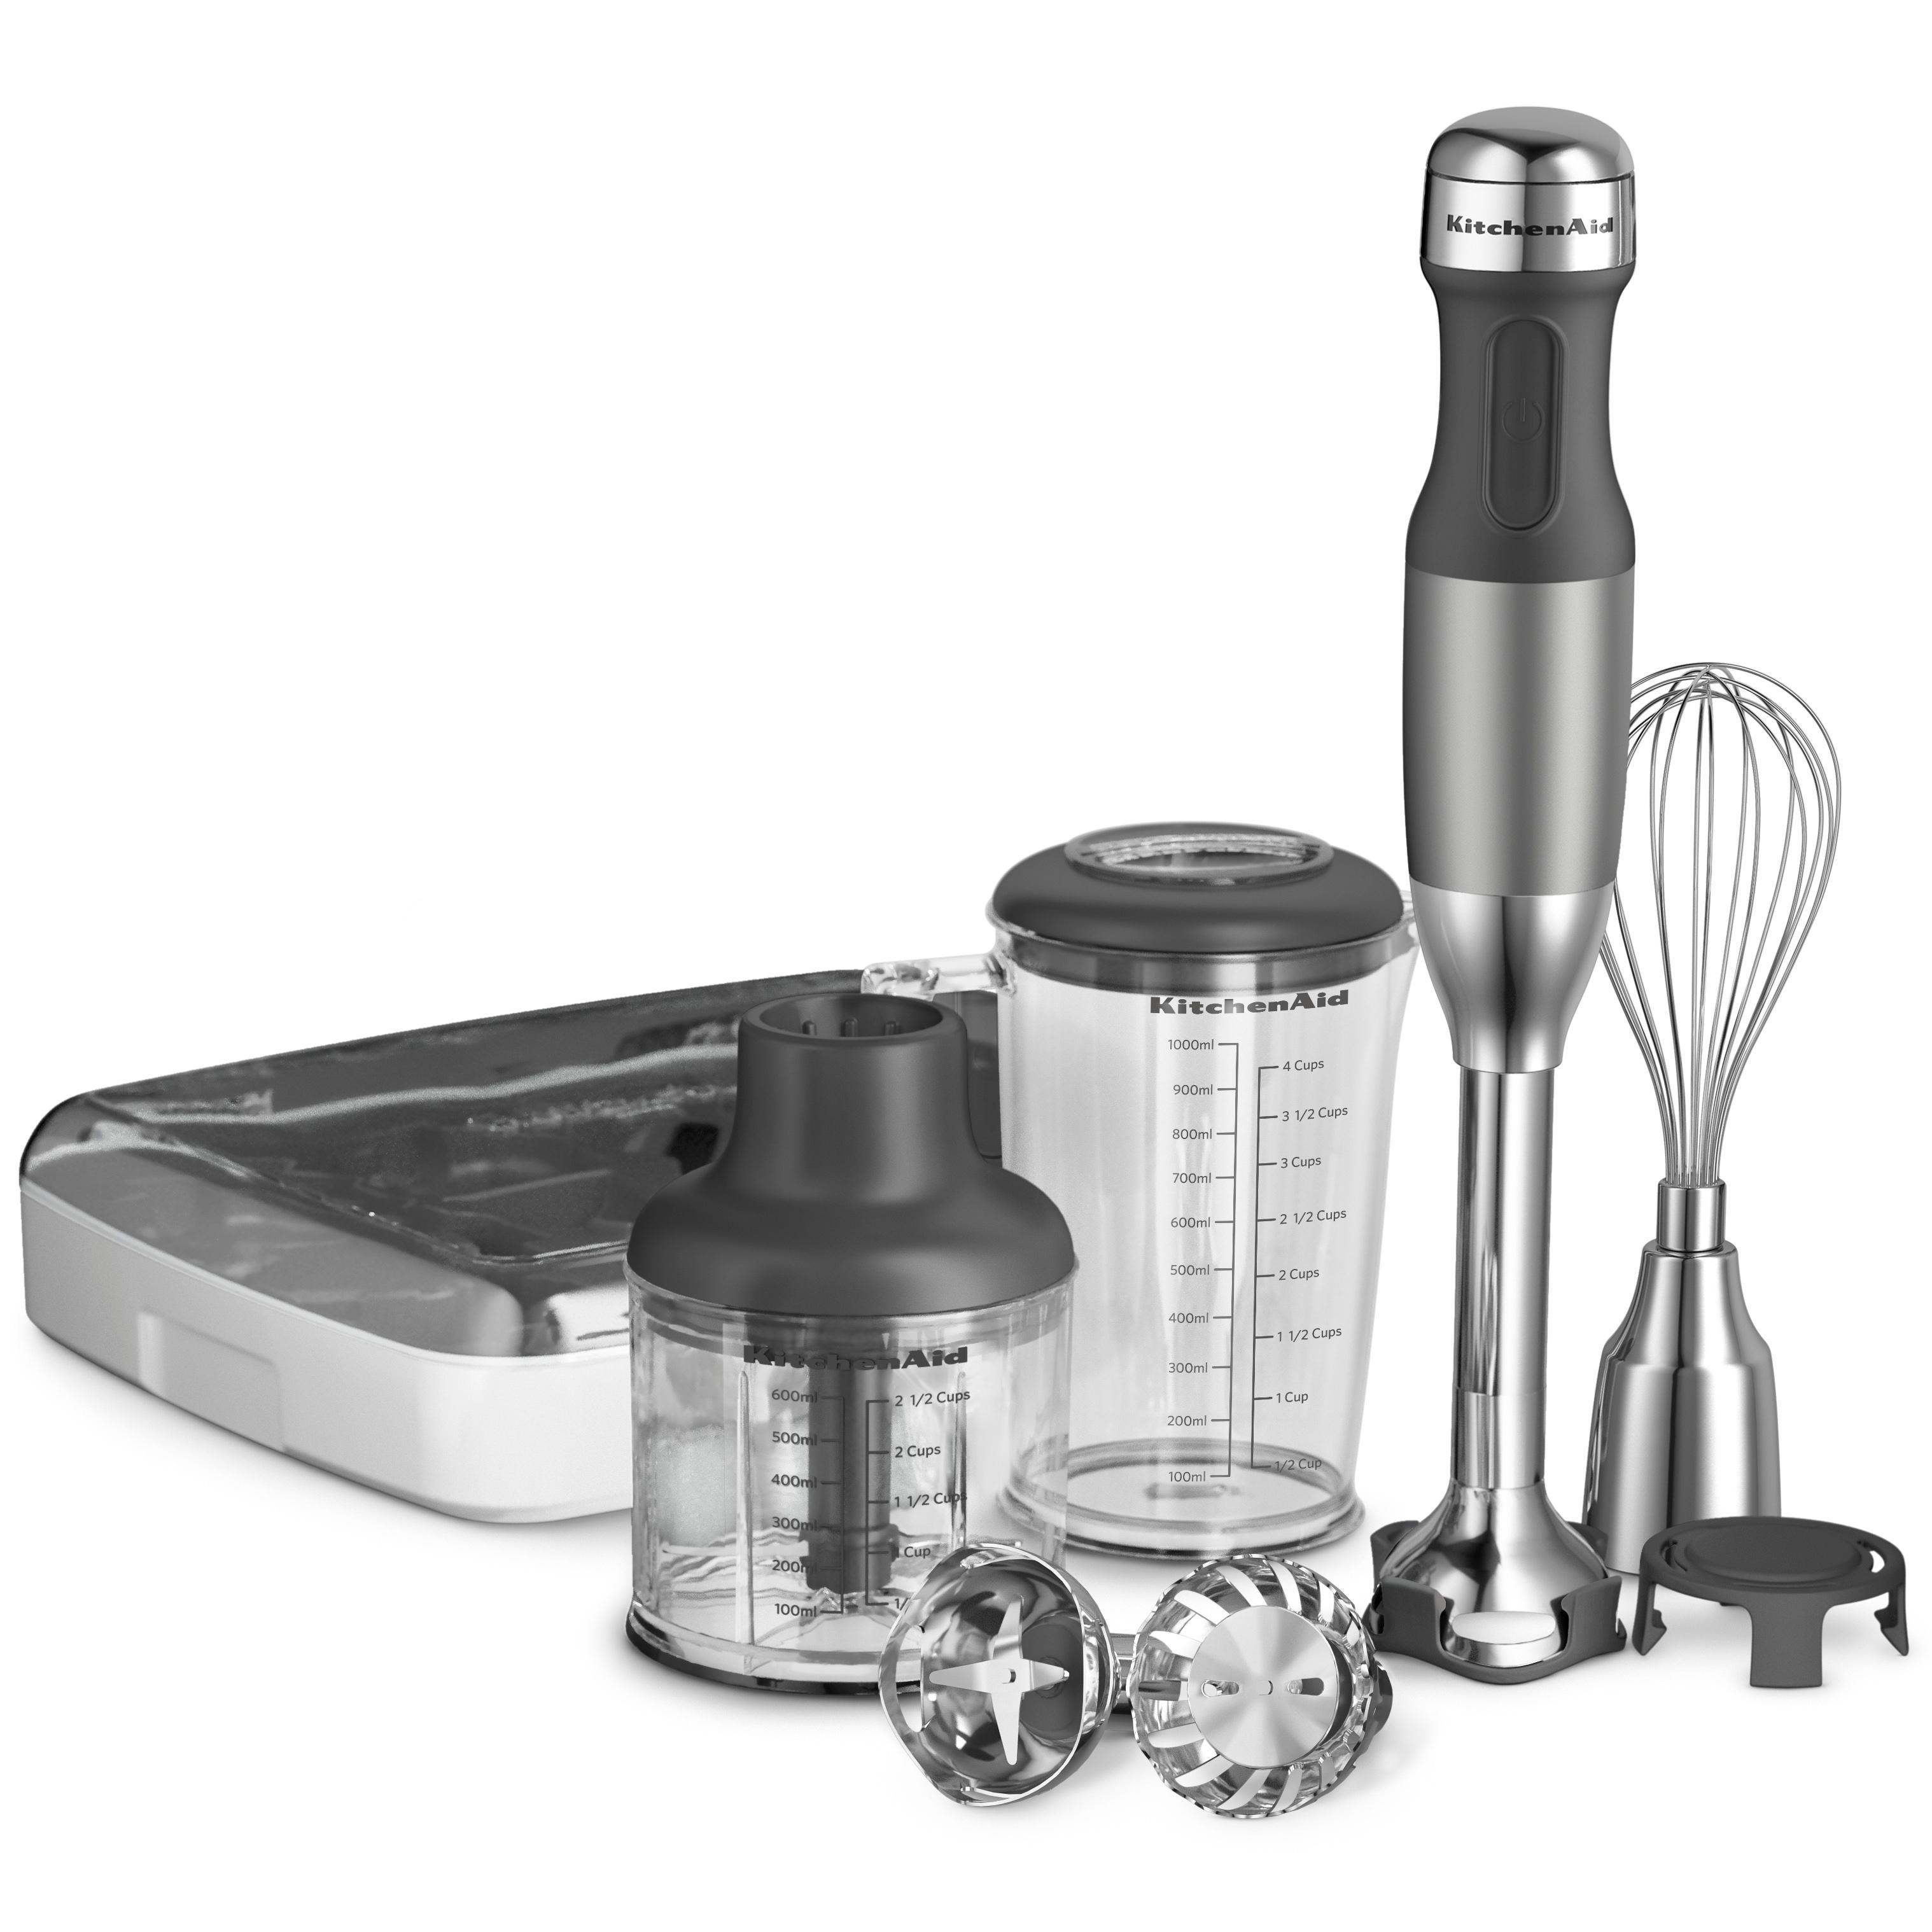 Amazoncom KitchenAid KHB2351CU 3Speed Hand Blender  Contour Silver Elect -> Kitchenaid Hand Blender